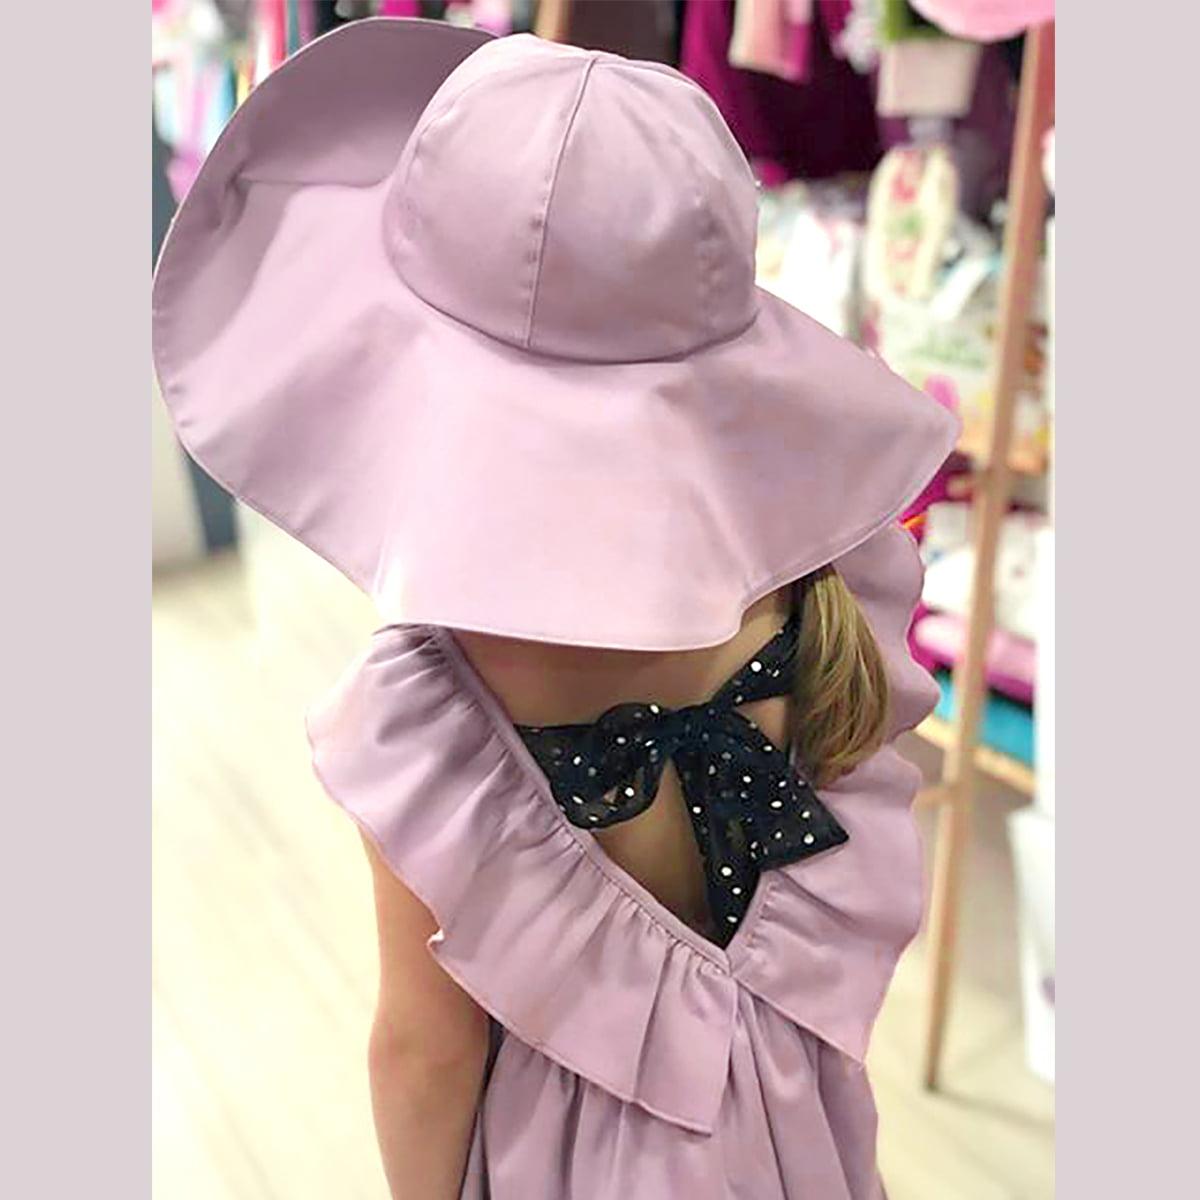 komplet šešir i haljina Anđela